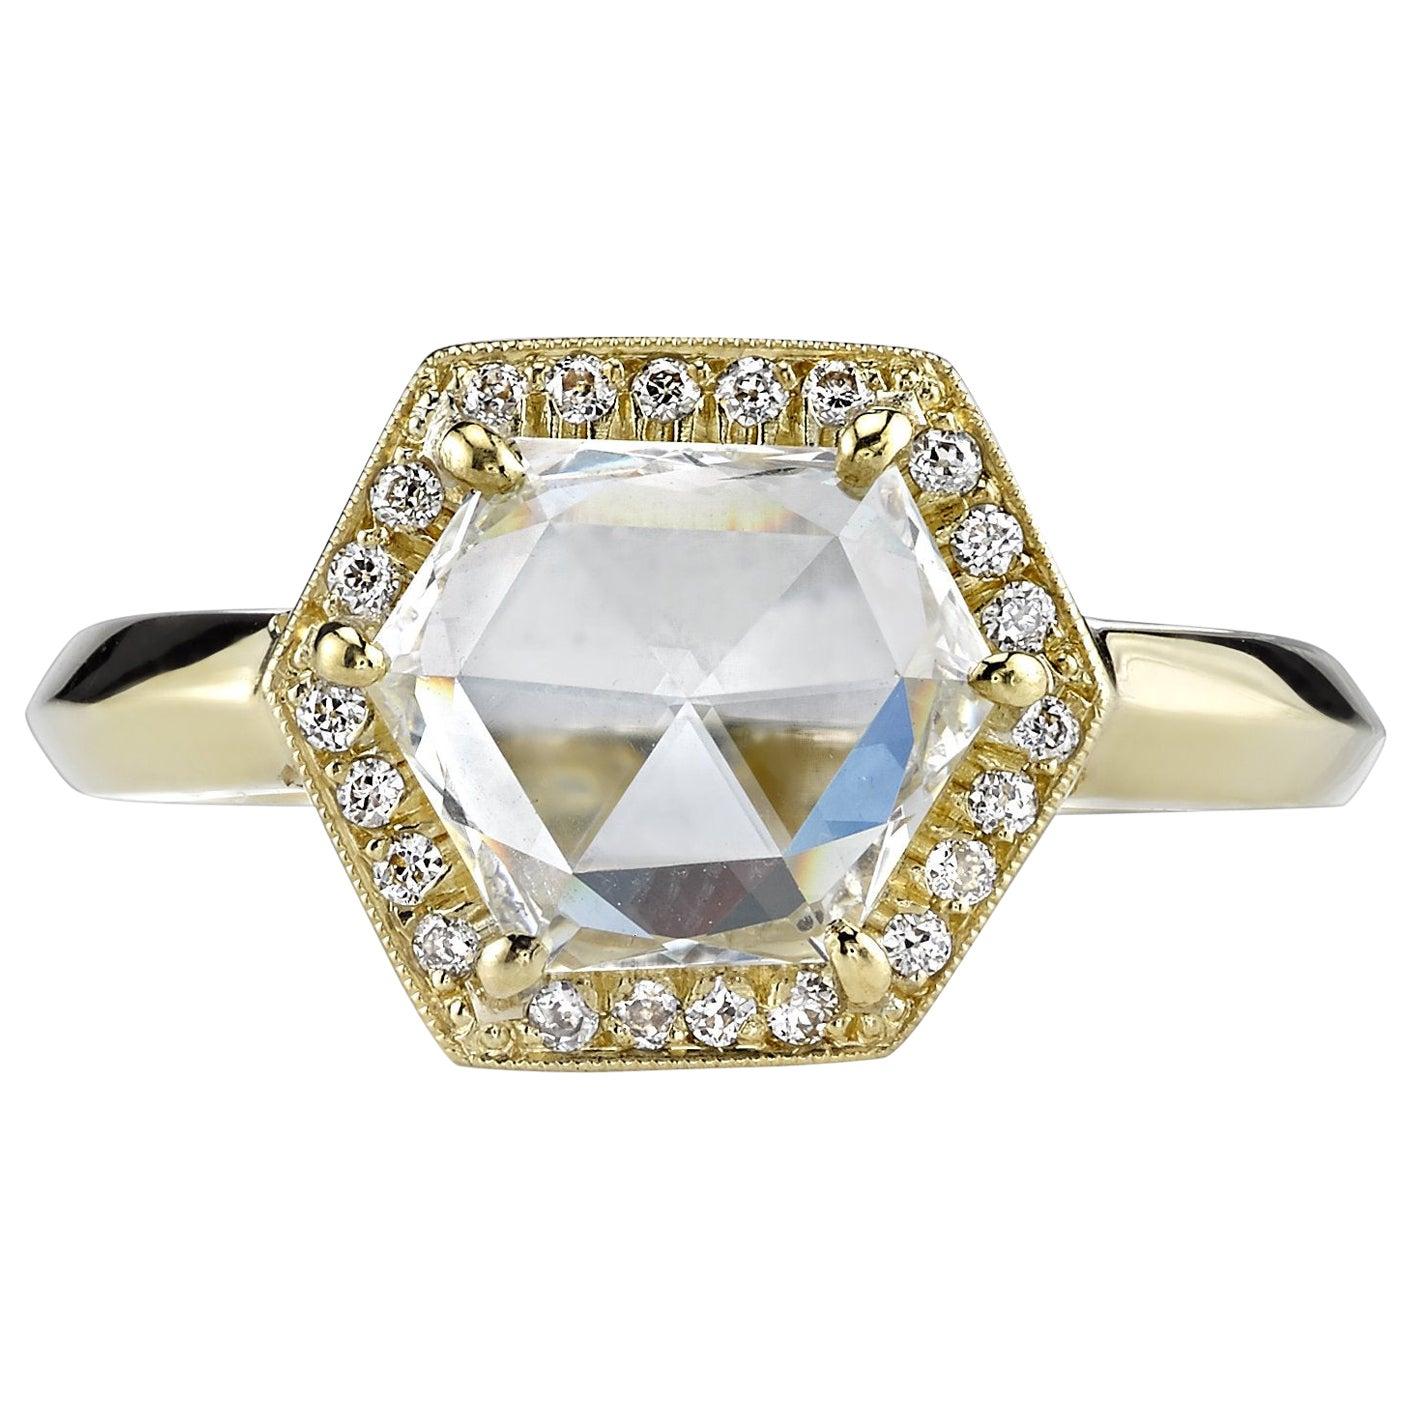 1.66 Carat Rose Cut Diamond Set in a Handcrafted 18 Karat Yellow Gold Ring